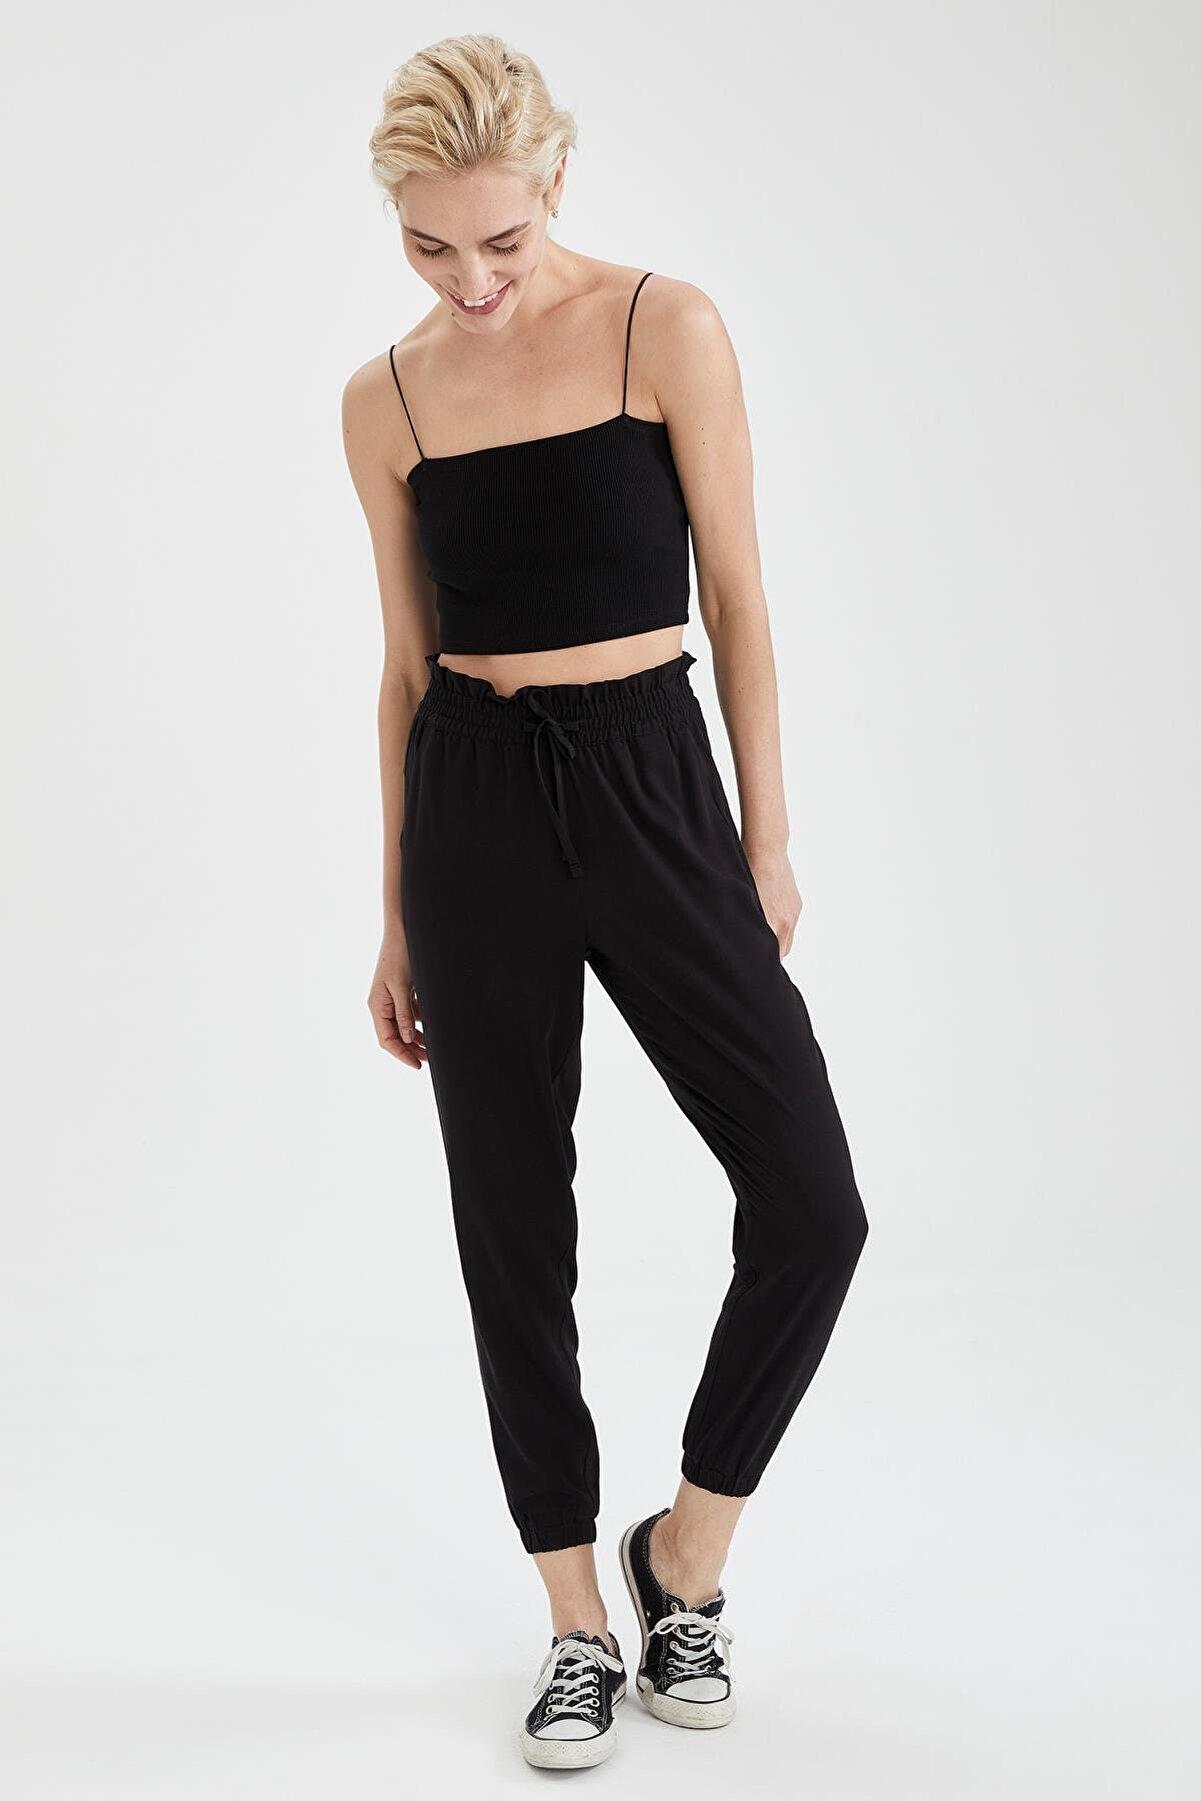 Defacto Kadın Siyah Beli Bağcıklı Relax Fit Jogger Pantolon